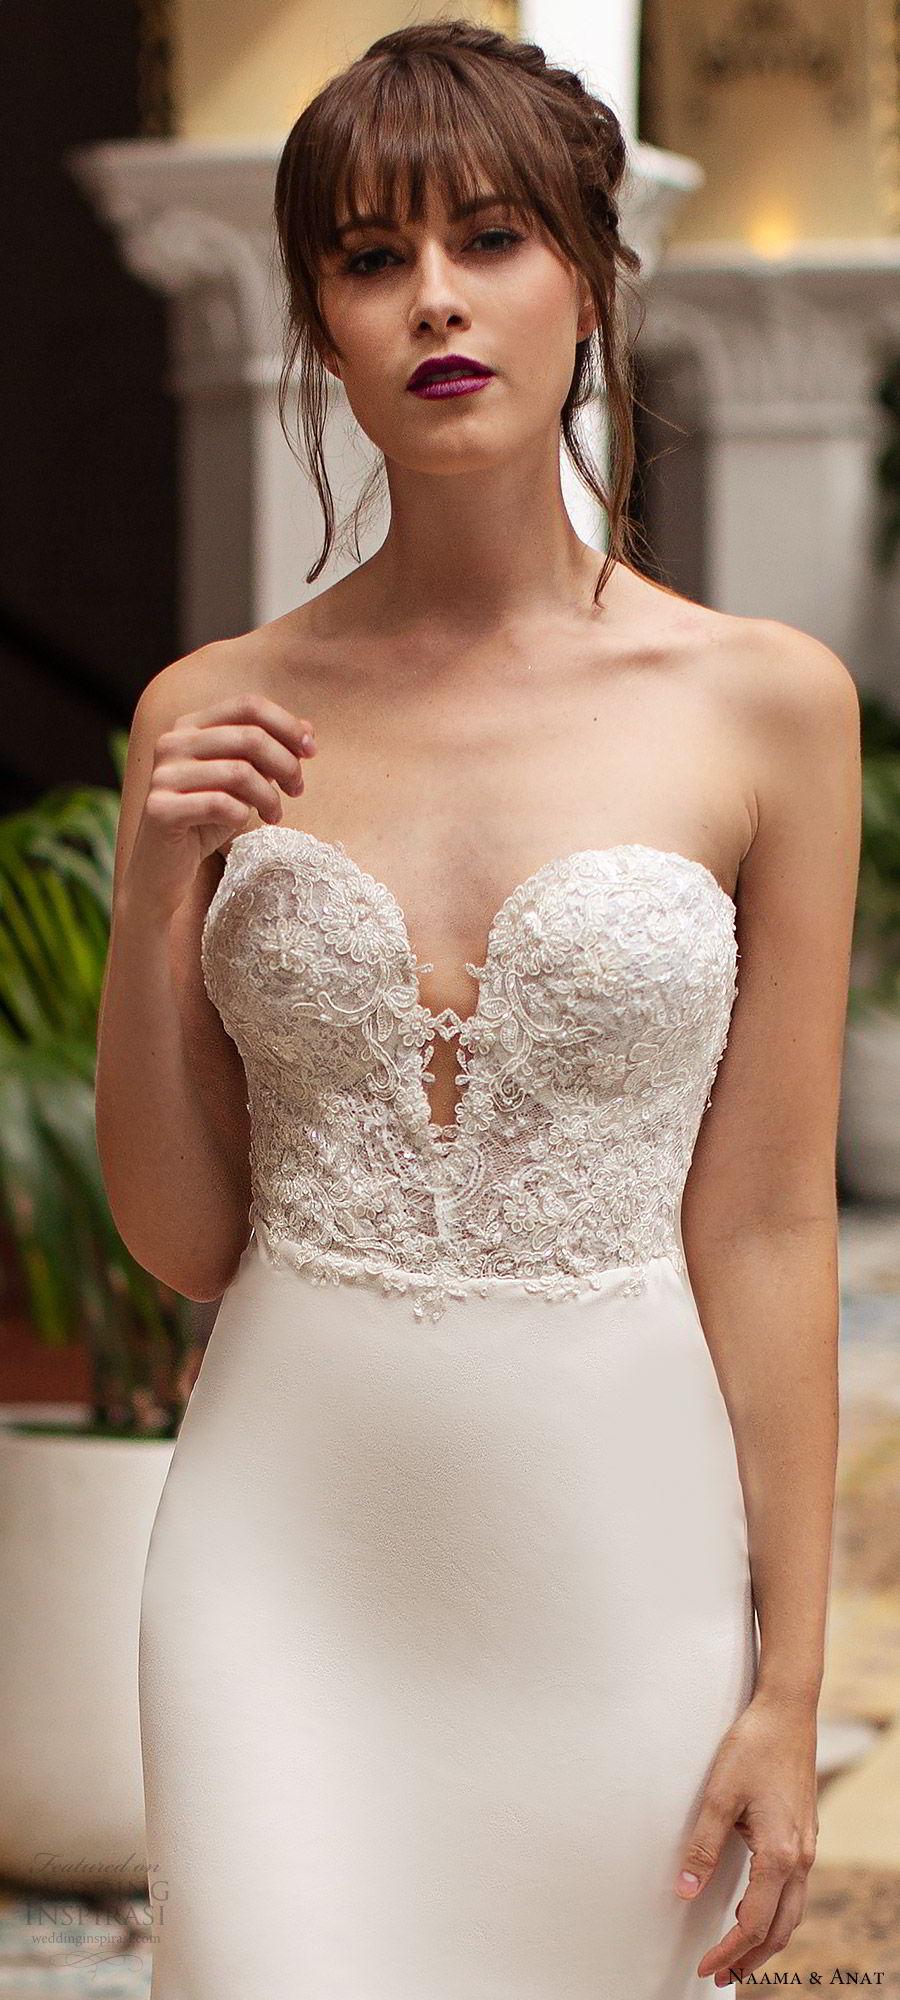 naama anat 2019 bridal strapless sweetheart embellished bodice sheath wedding dress  low back chapel train elegant modern (4) zv